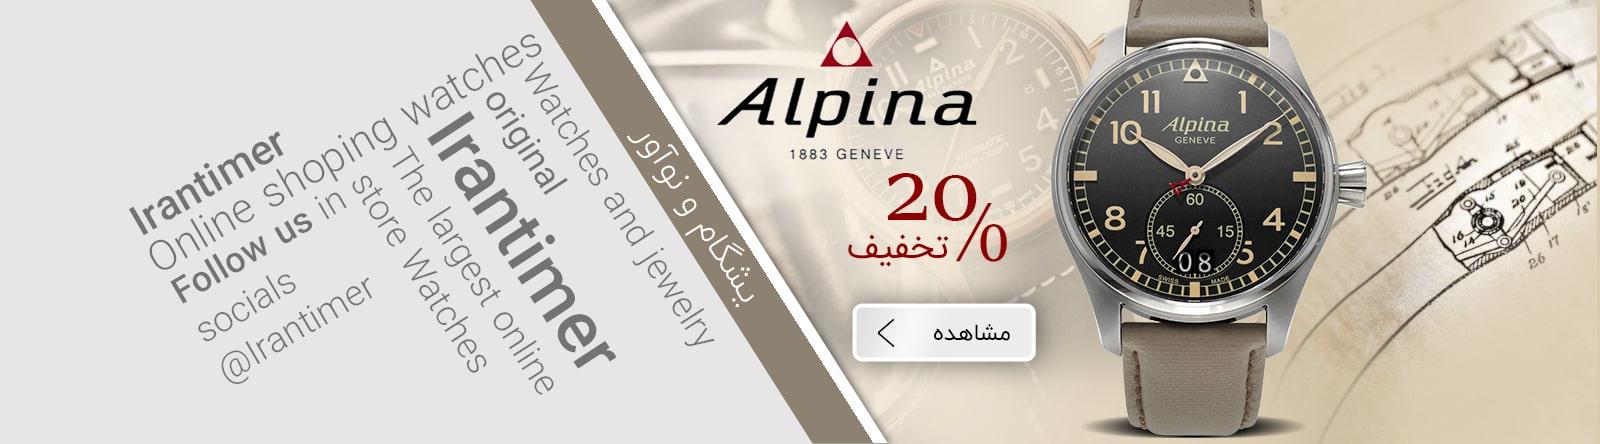 20 درصد تخفیف آلپینا